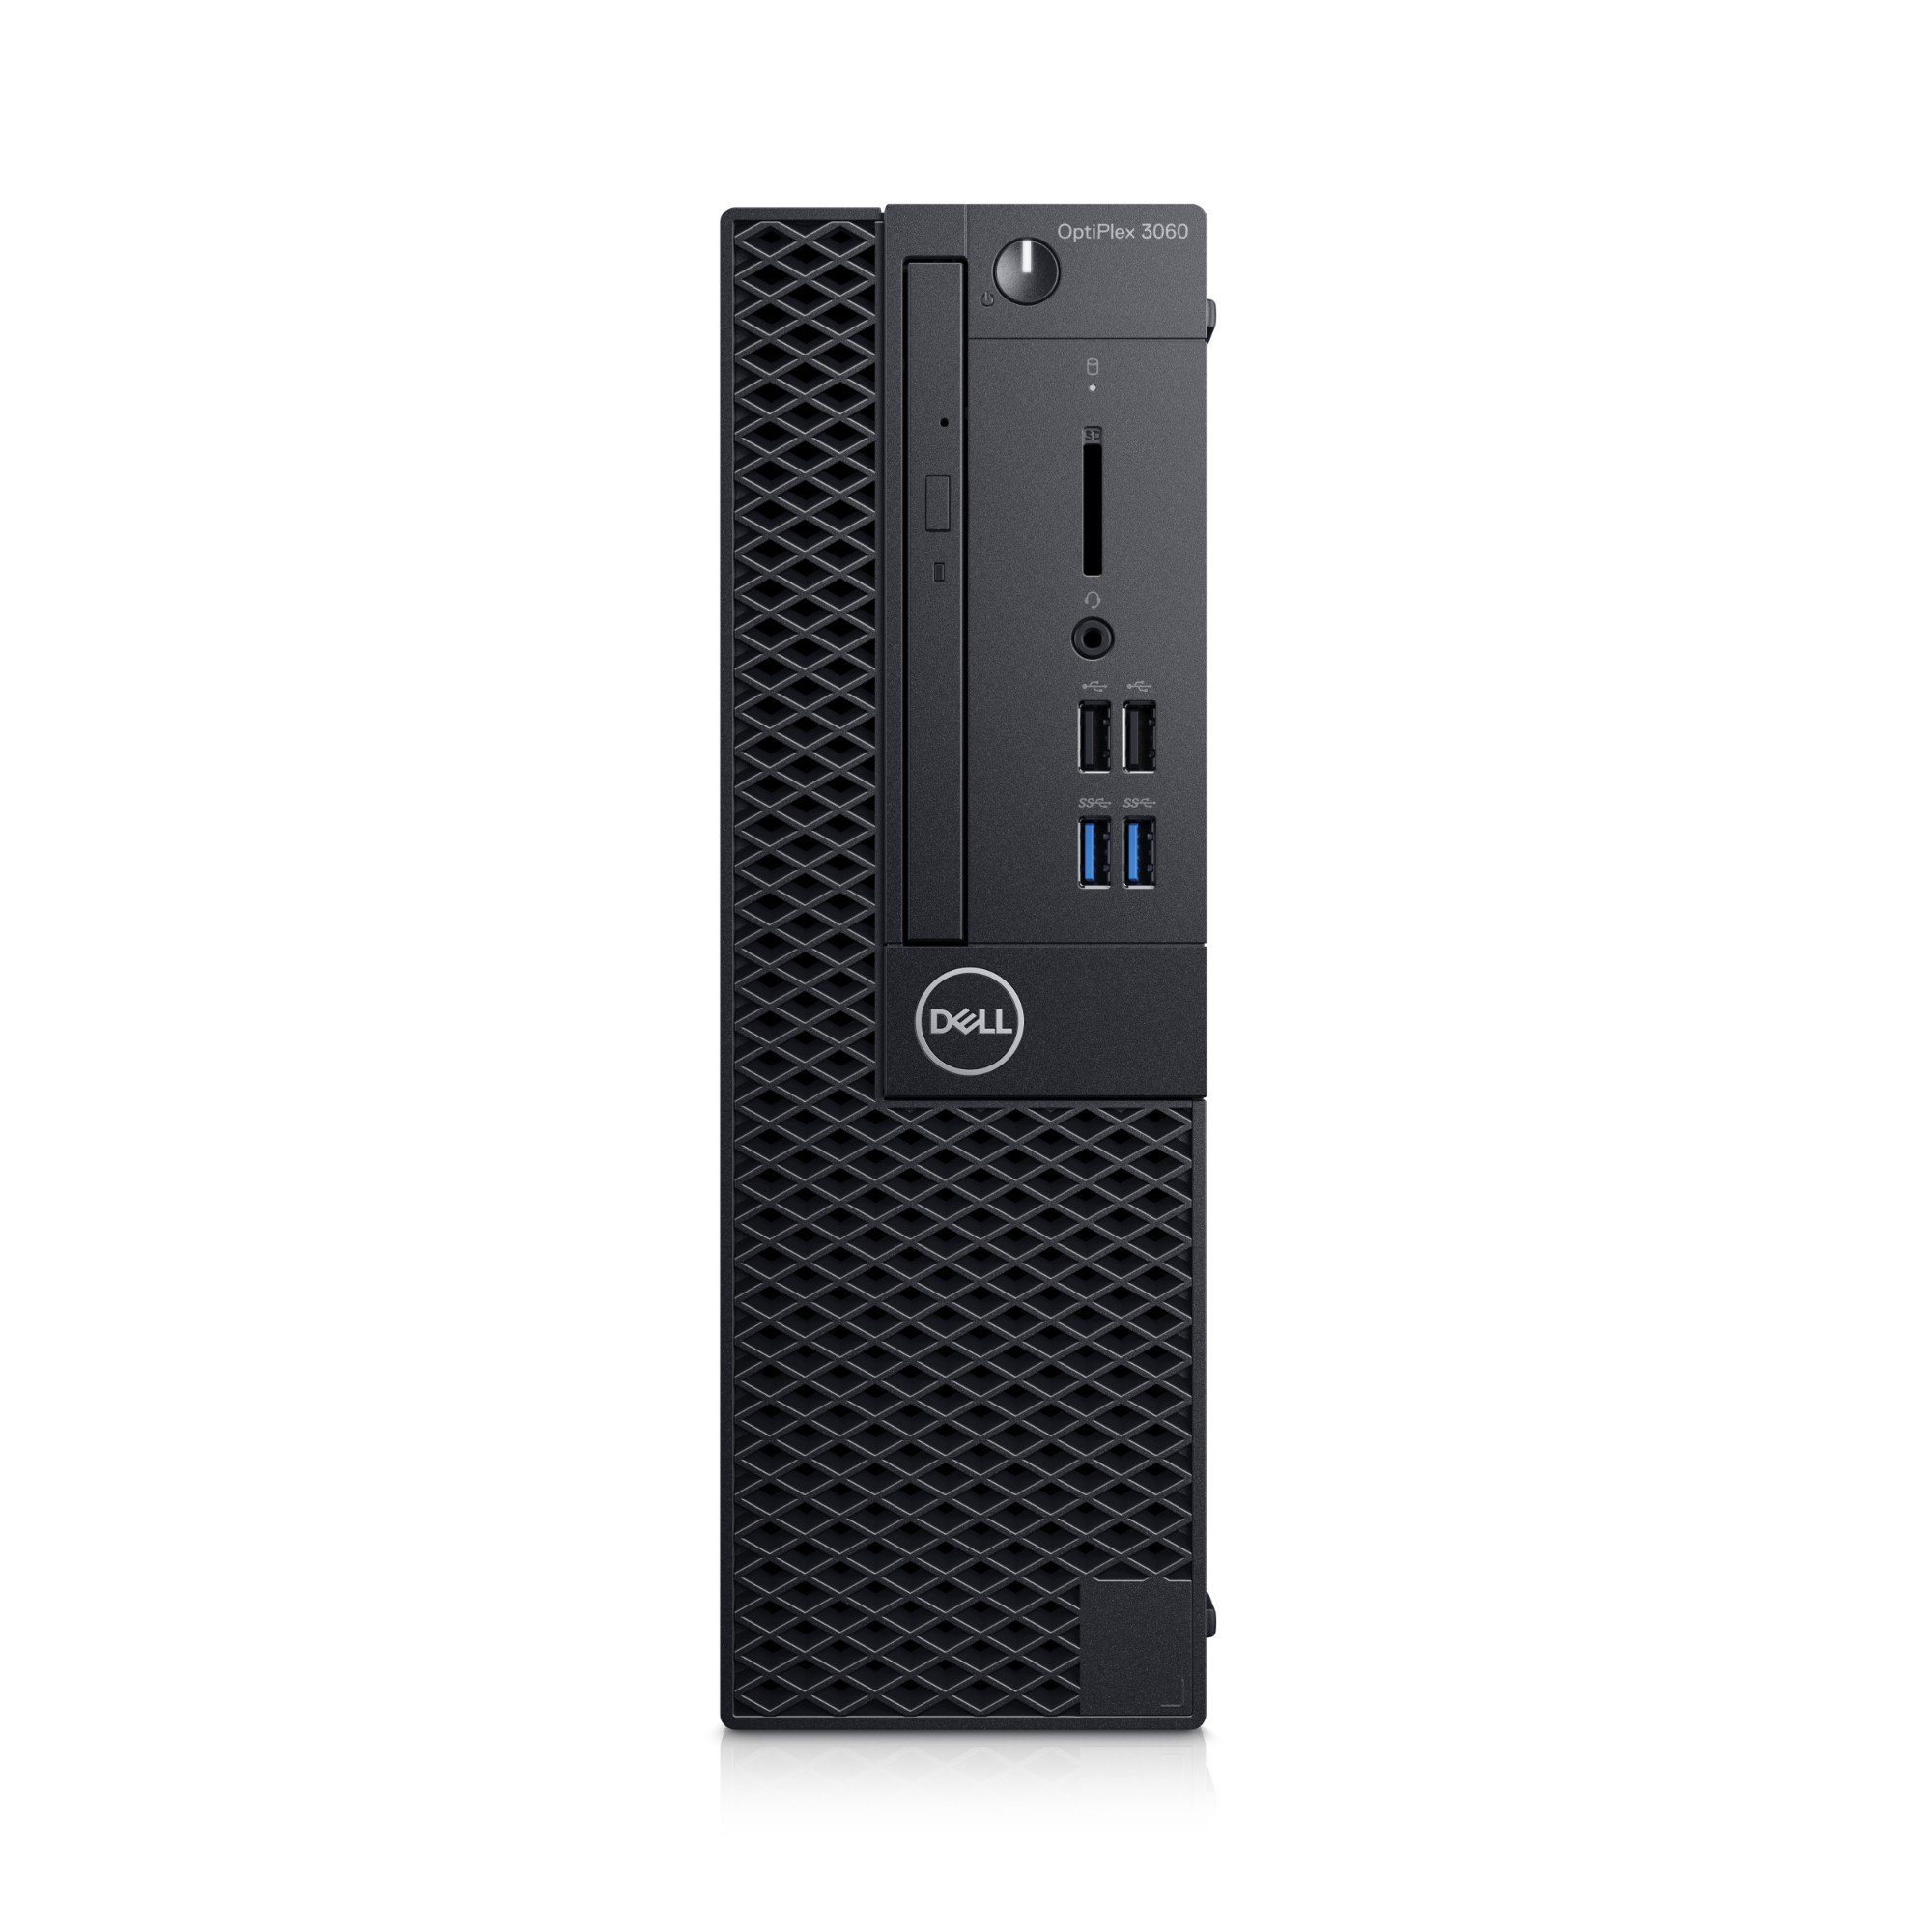 DELL OptiPlex 3060 8ª generación de procesadores Intel® Core™ i5 i5-8500 8 GB DDR4-SDRAM 1000 GB Unidad de disco duro Negro SFF PC